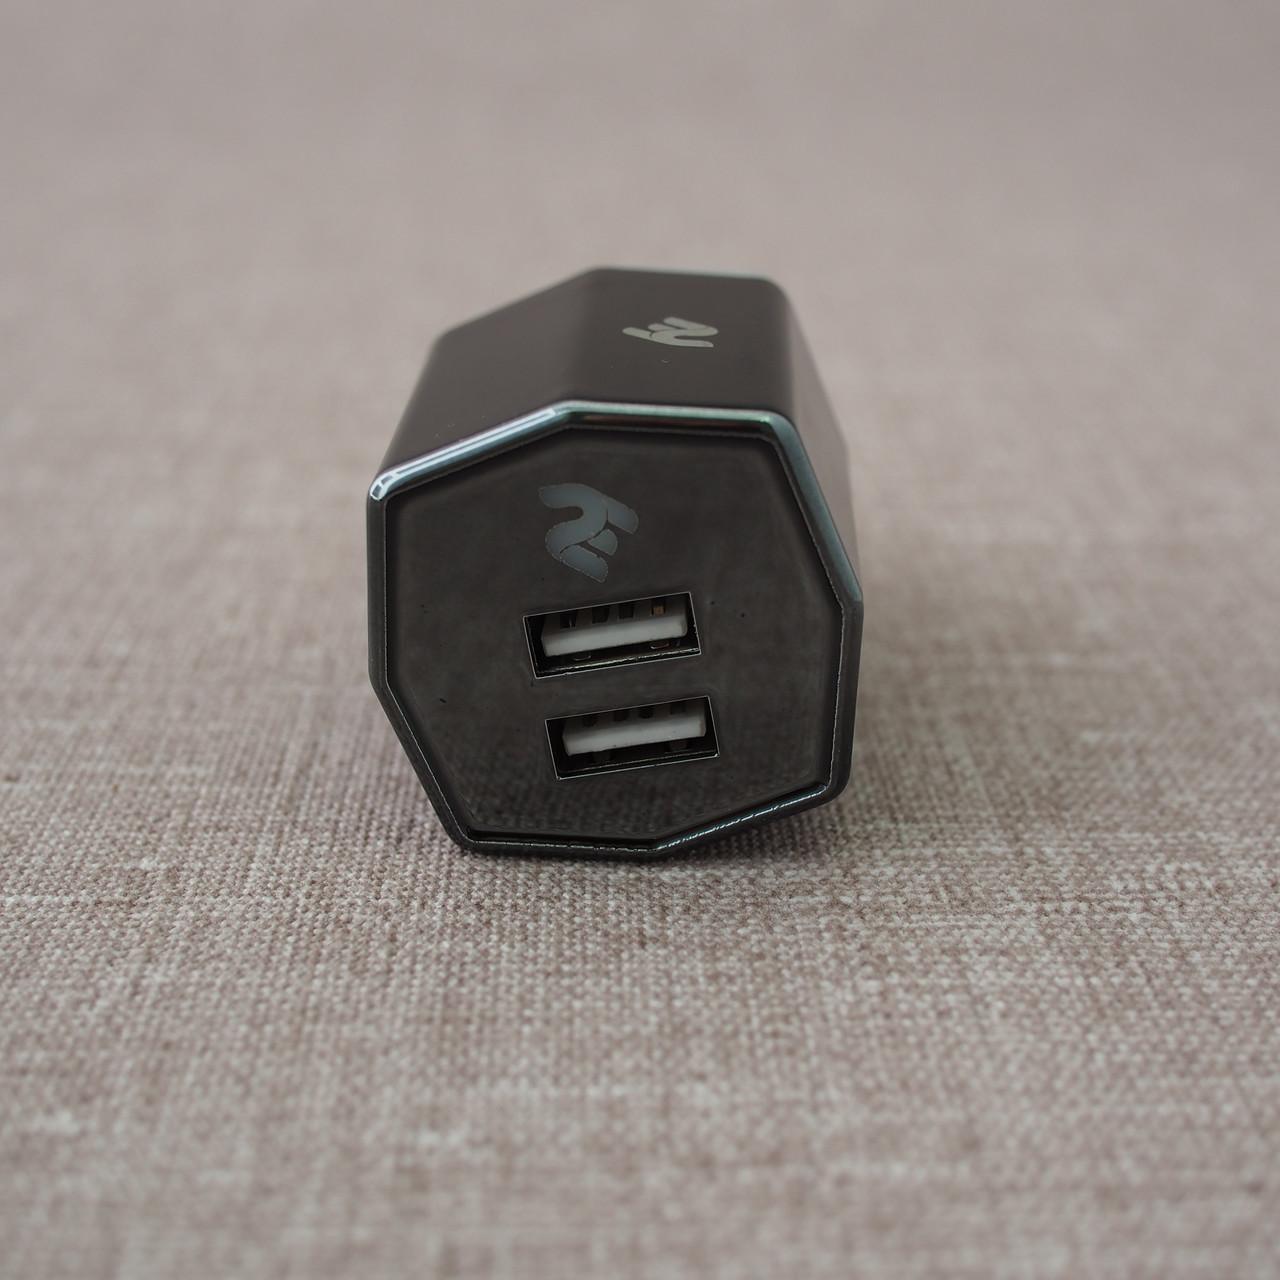 СЗУ без кабеля | USB Wall Charger З